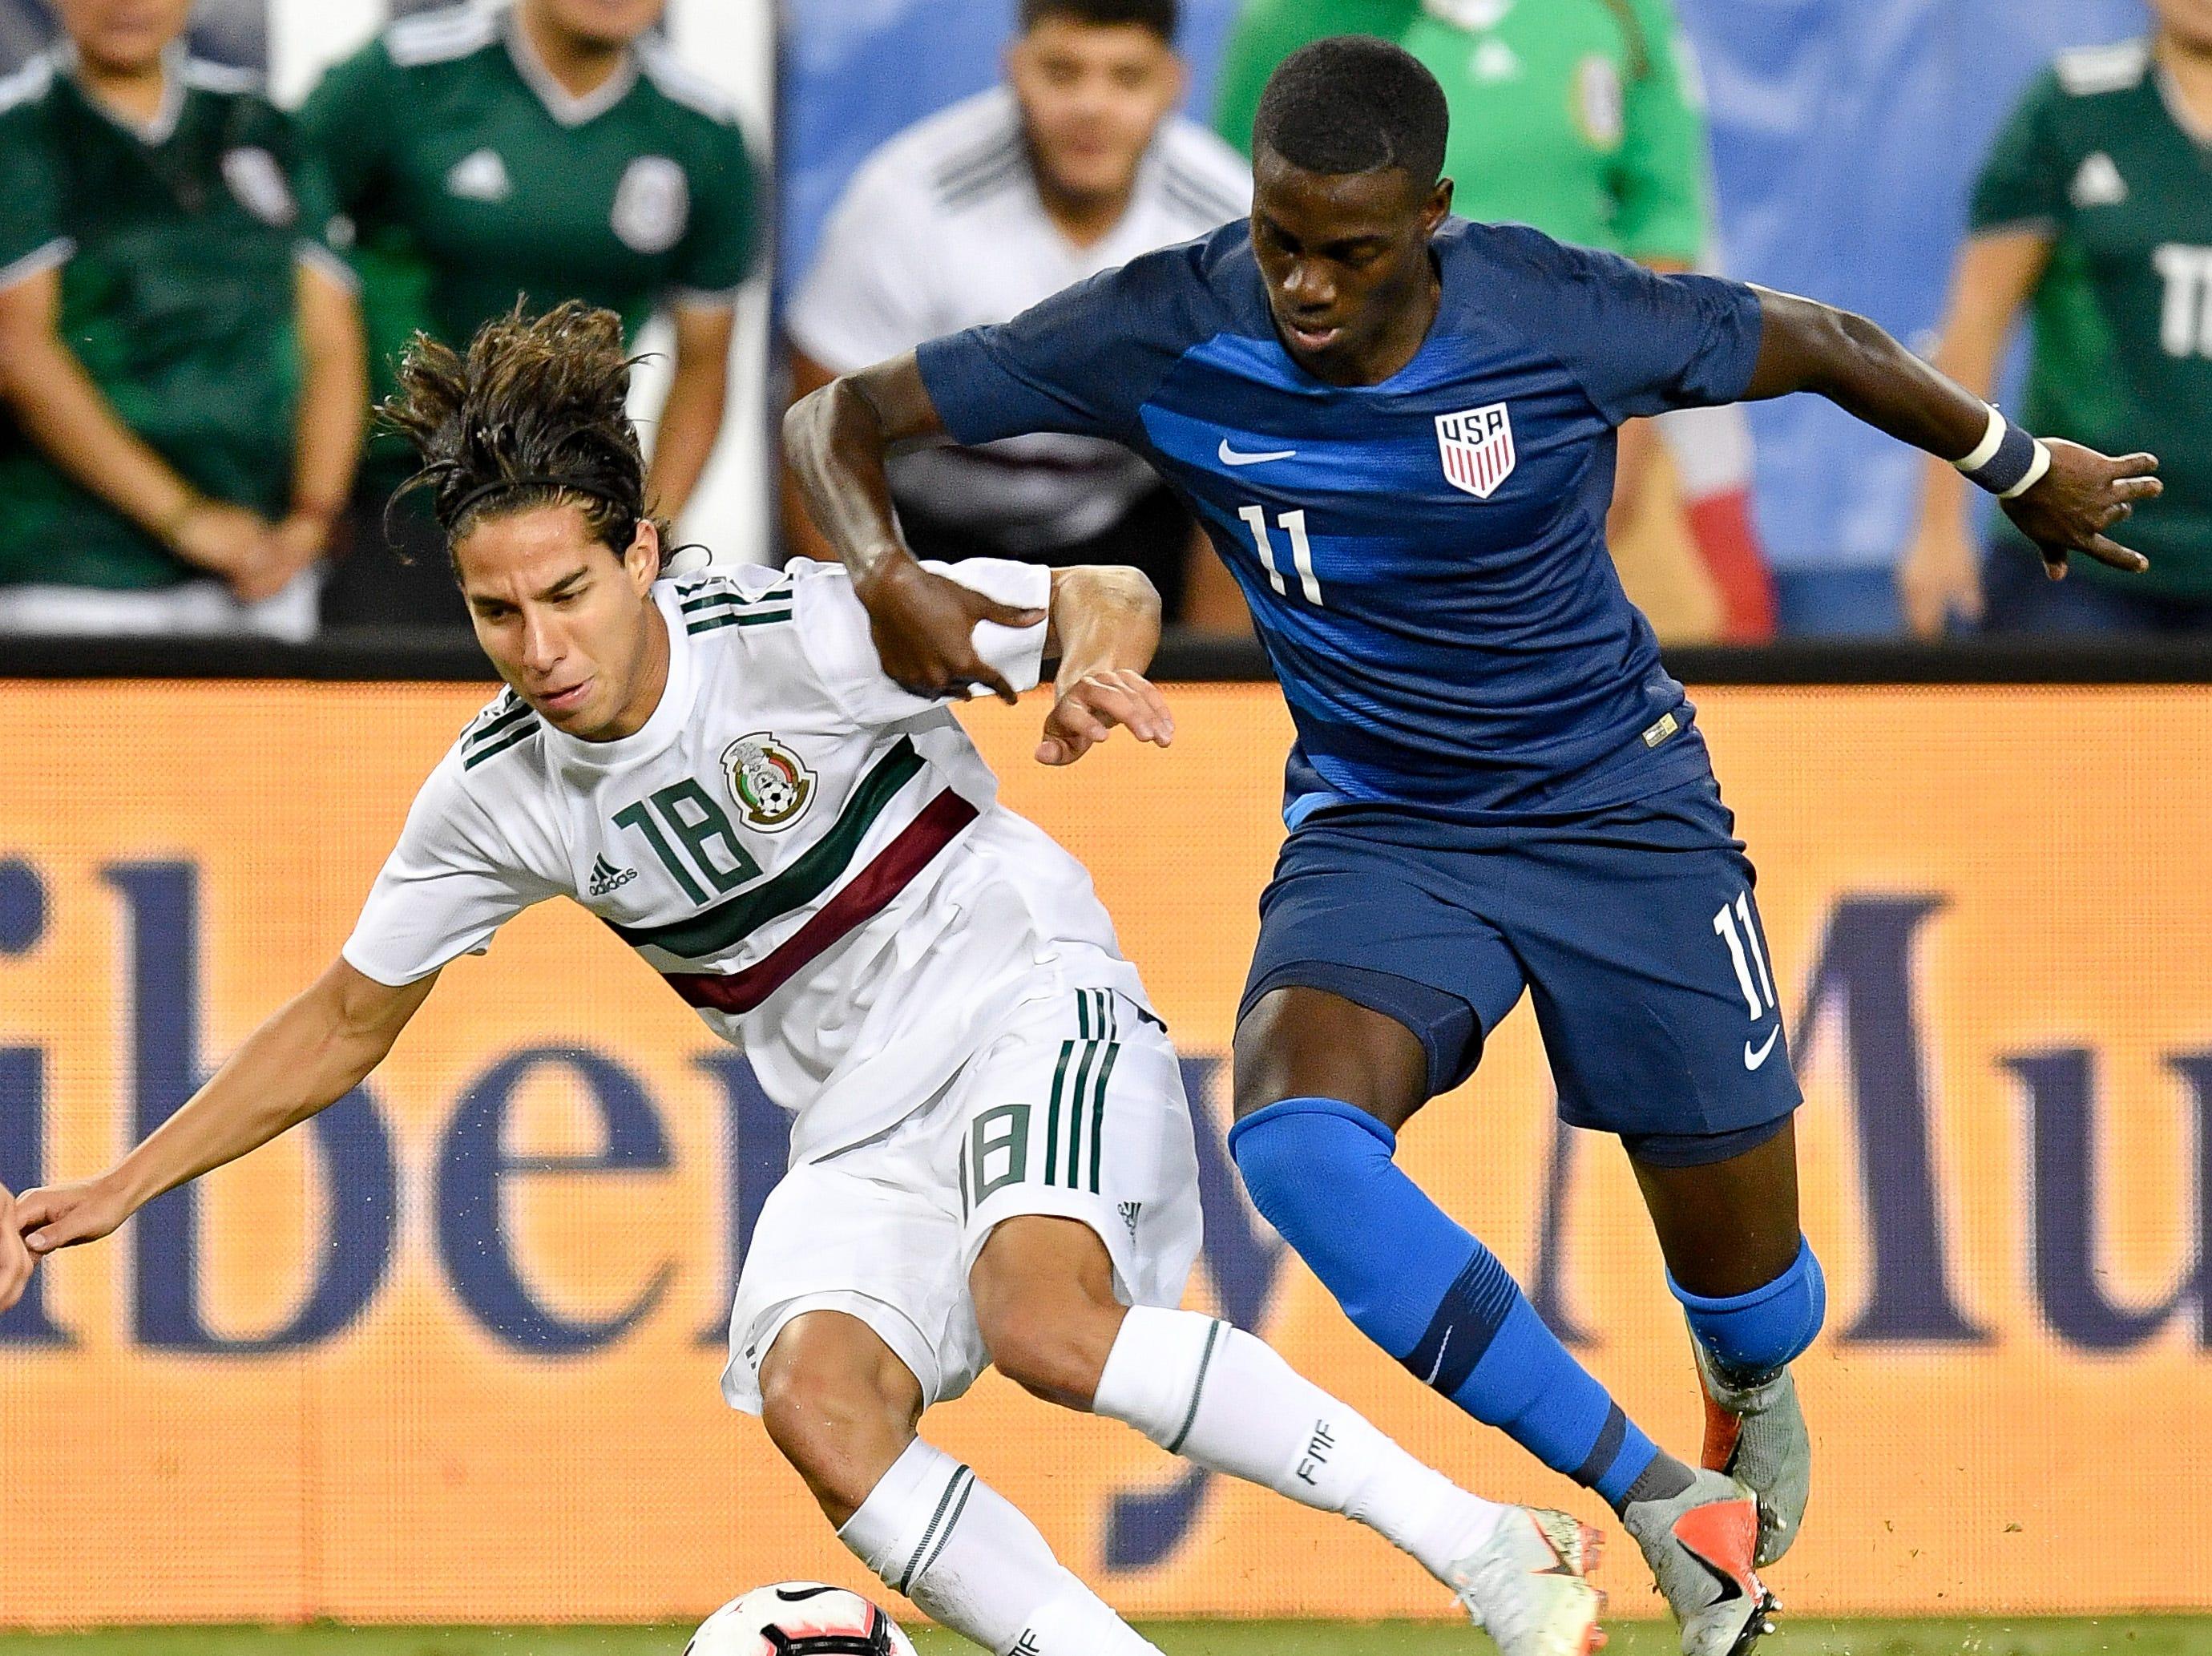 Mexico midfielder Diego Lainez (18) battles USA midfielder Tim Weah (11) during the second half at Nissan Stadium in Nashville, Tenn., Tuesday, Sept. 11, 2018.